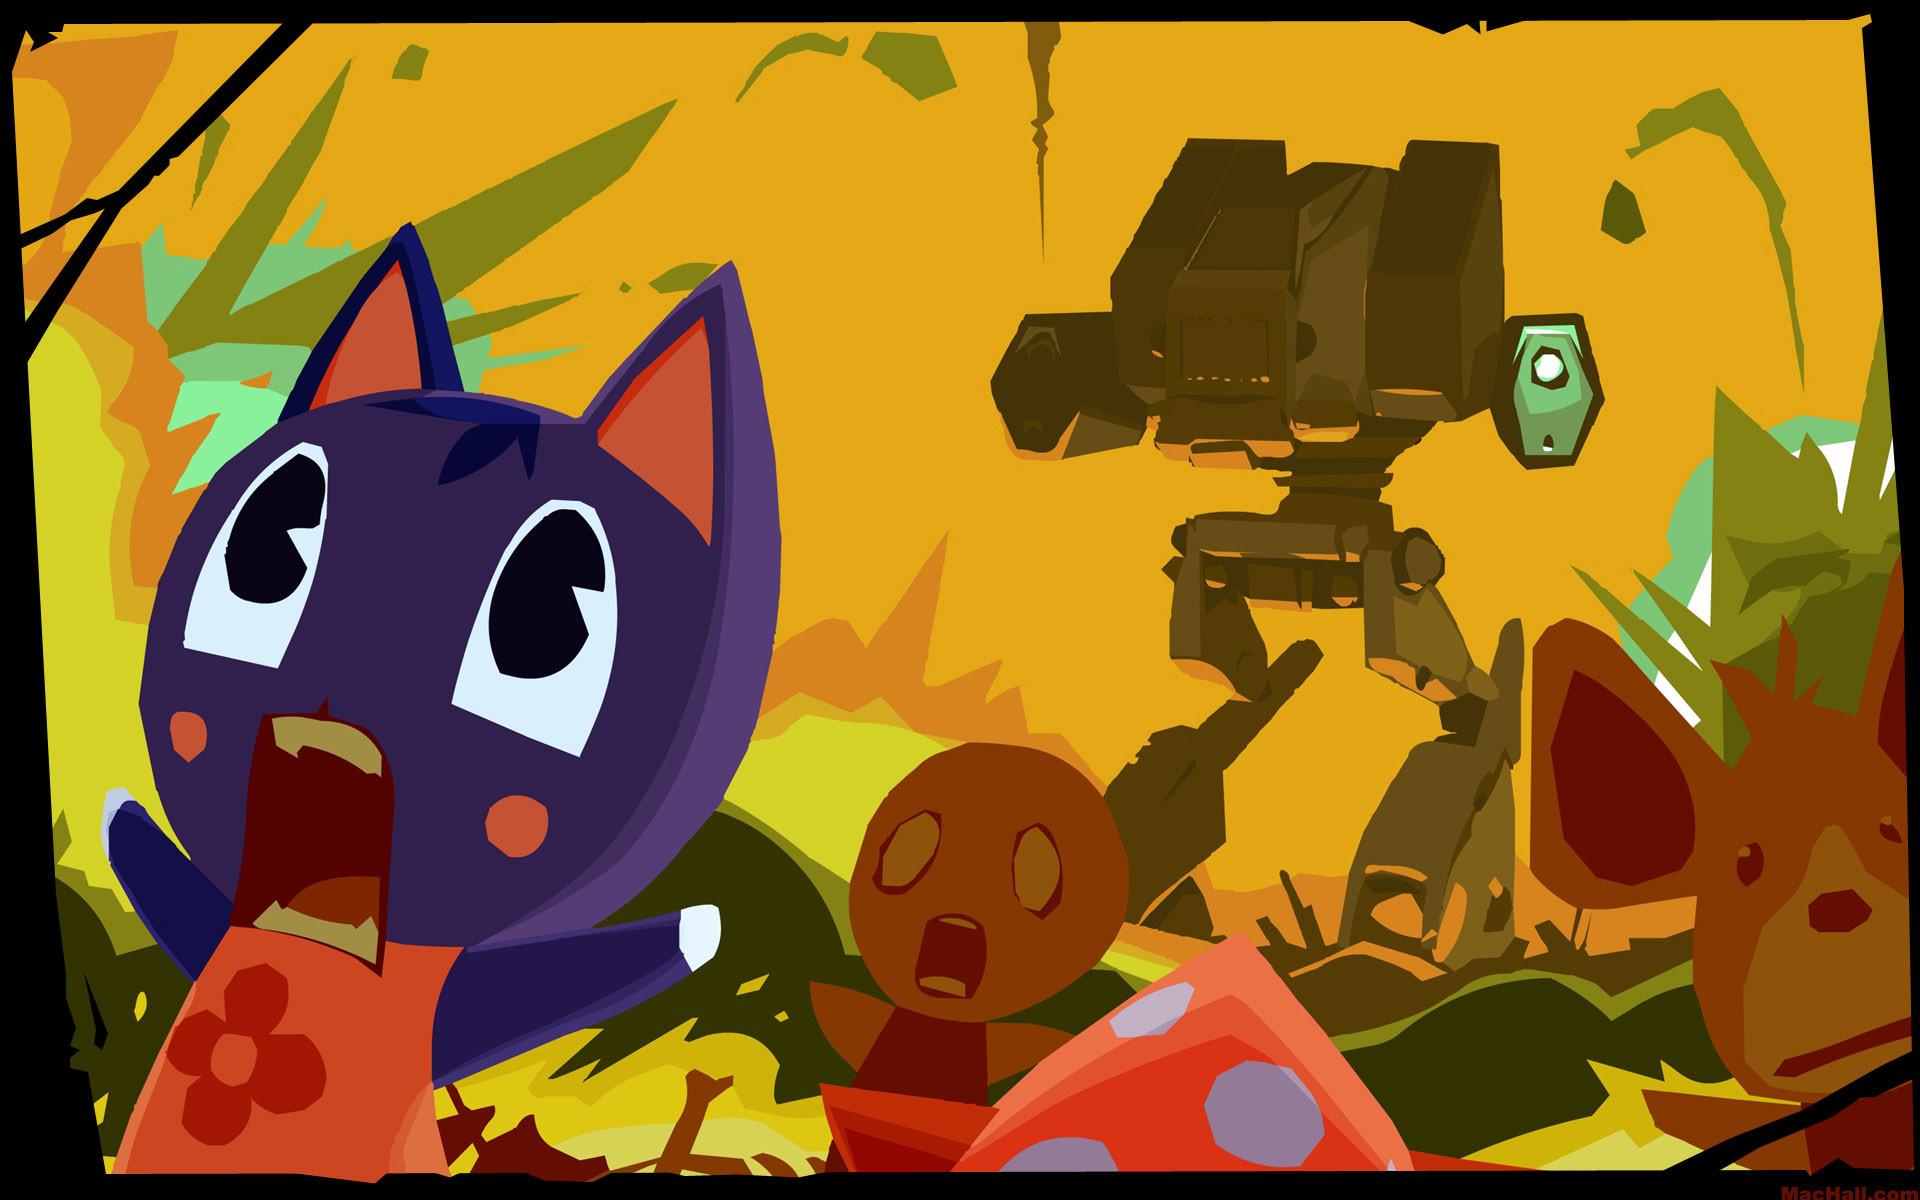 Download Original Wallpaper Category:games …